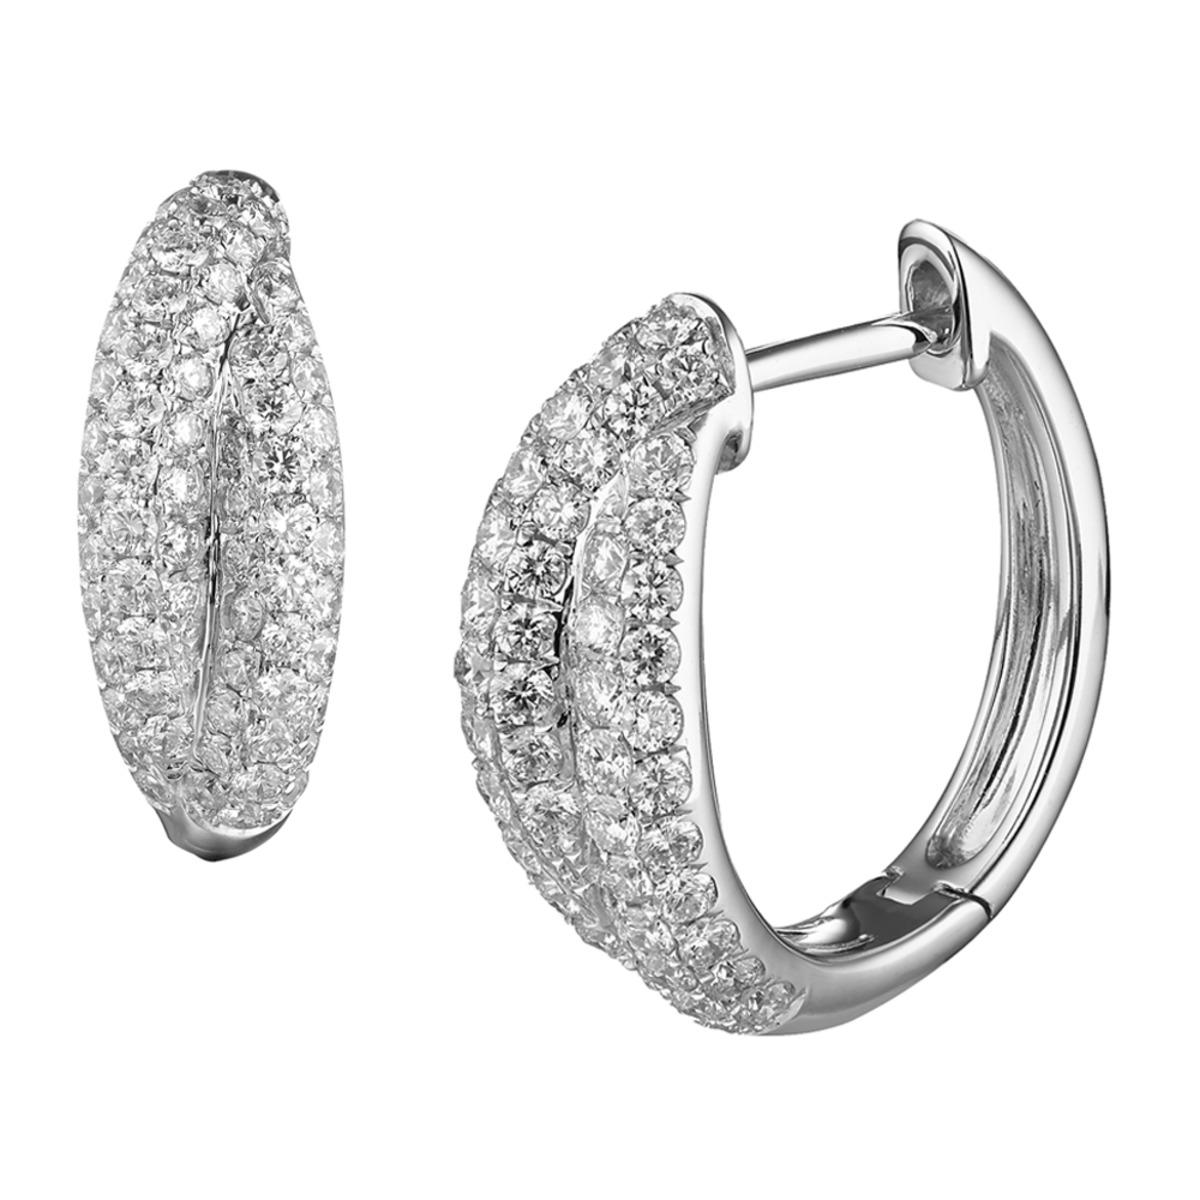 1克拉鑽石耳環 VS2, I